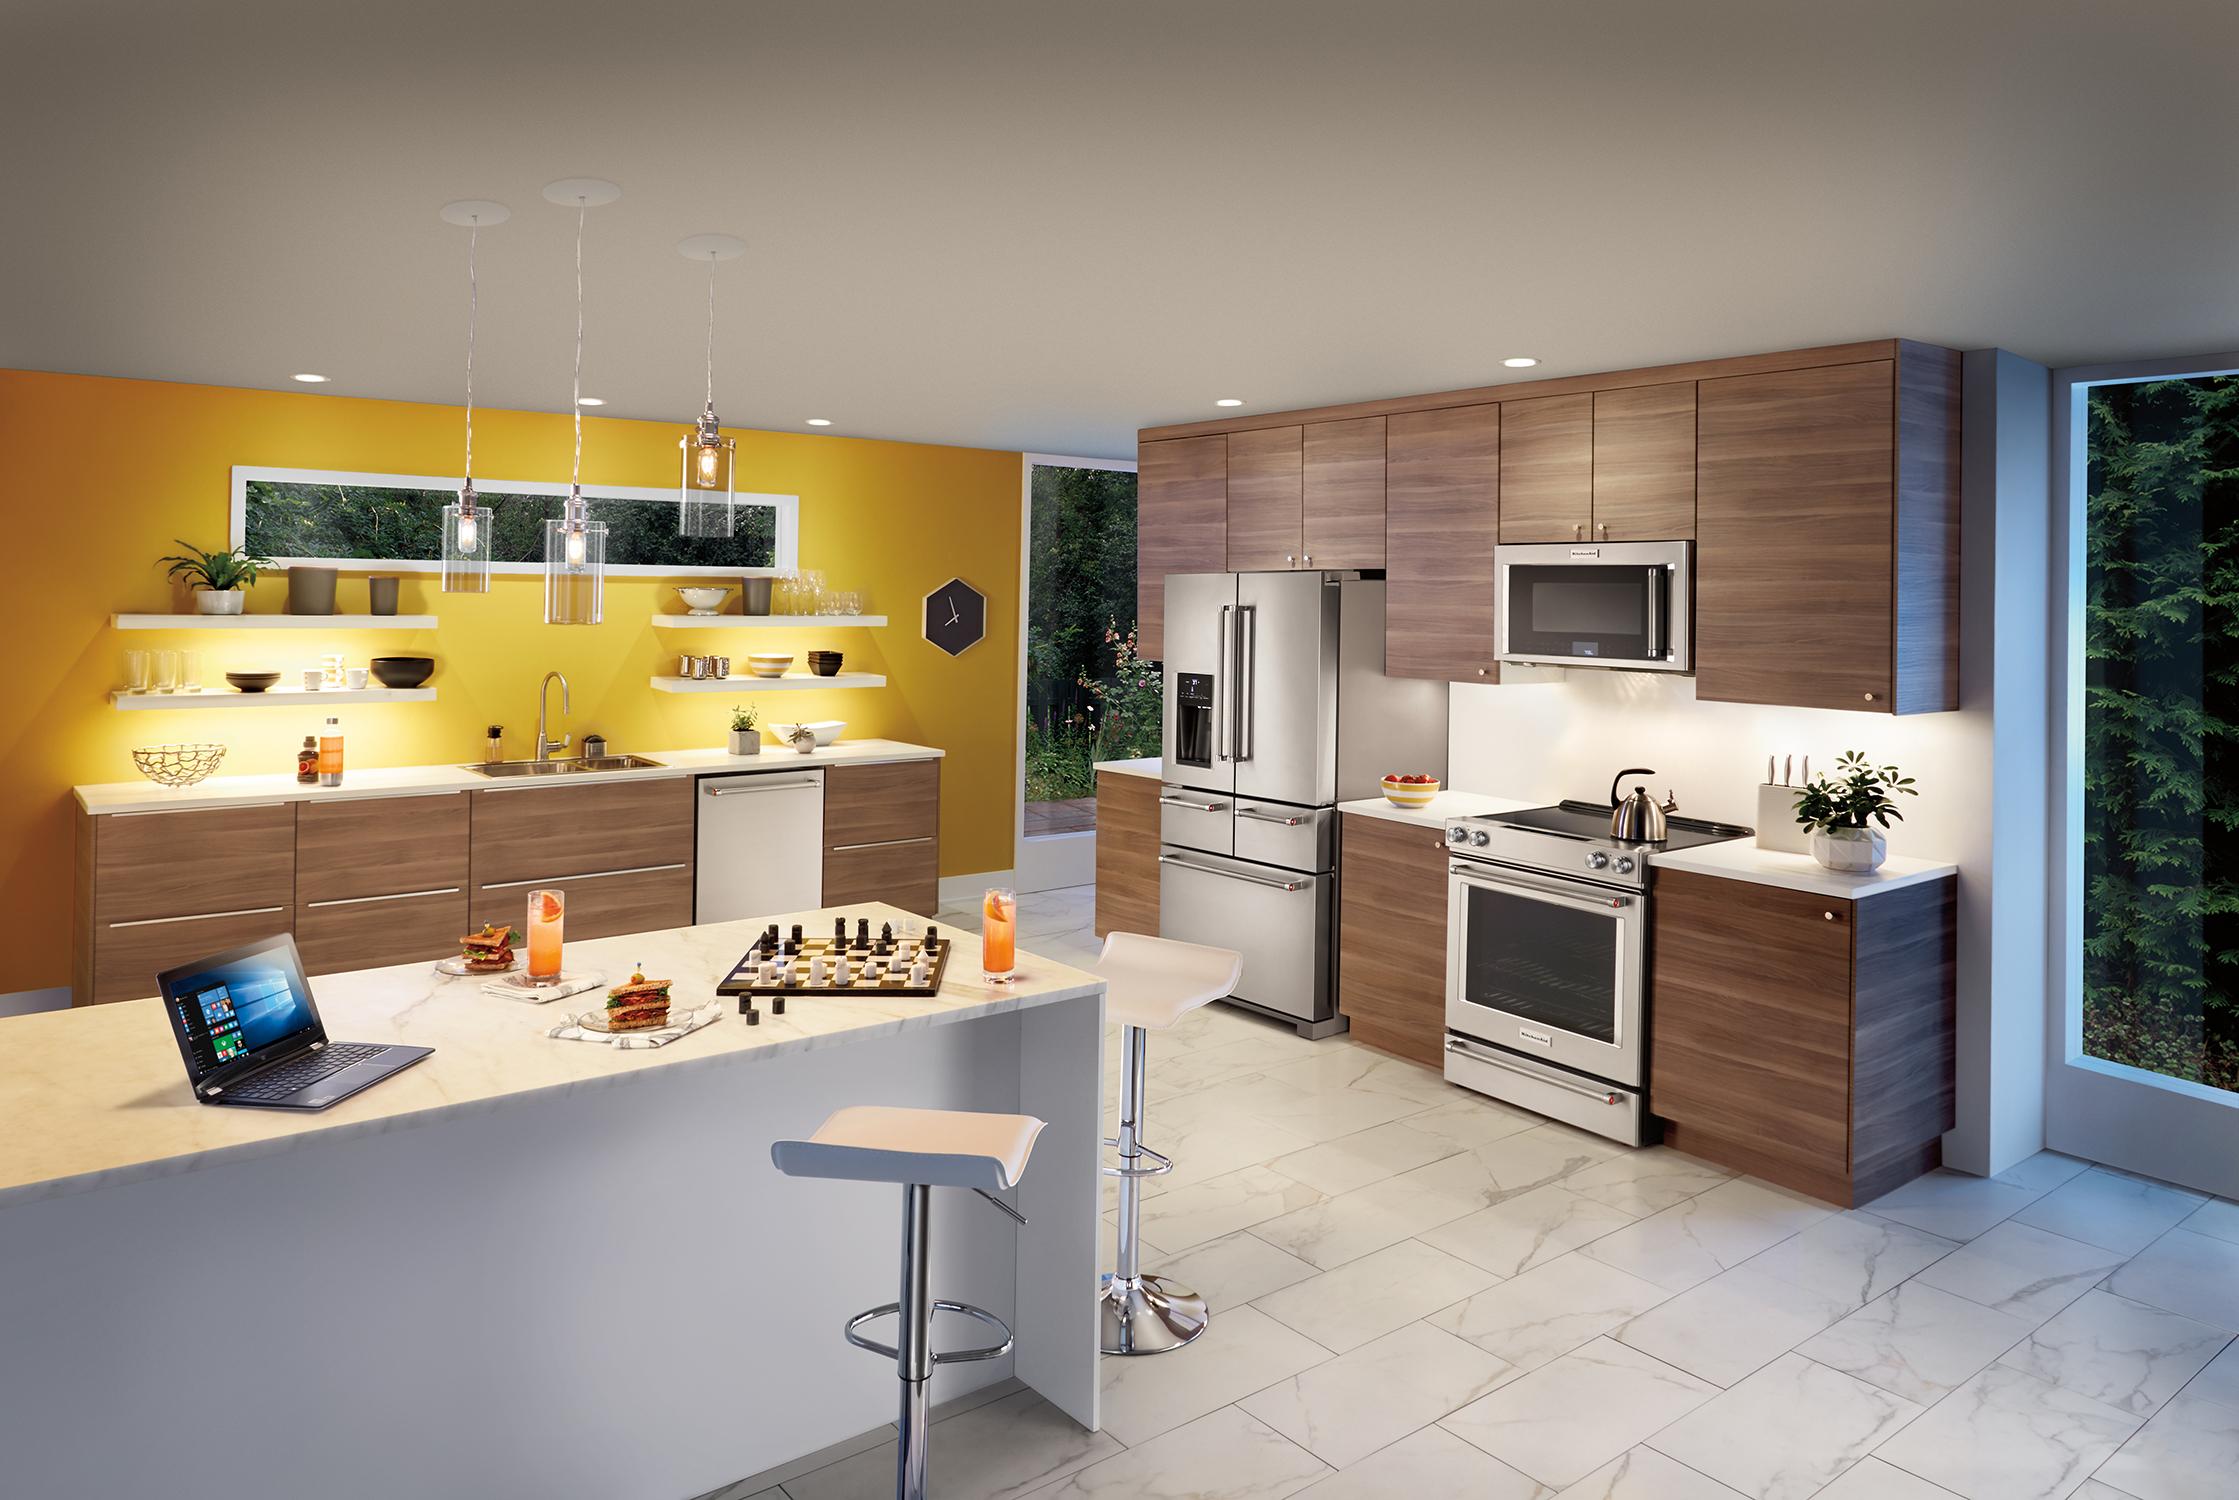 #BestBuy #KitchenAid #Foodie #ad